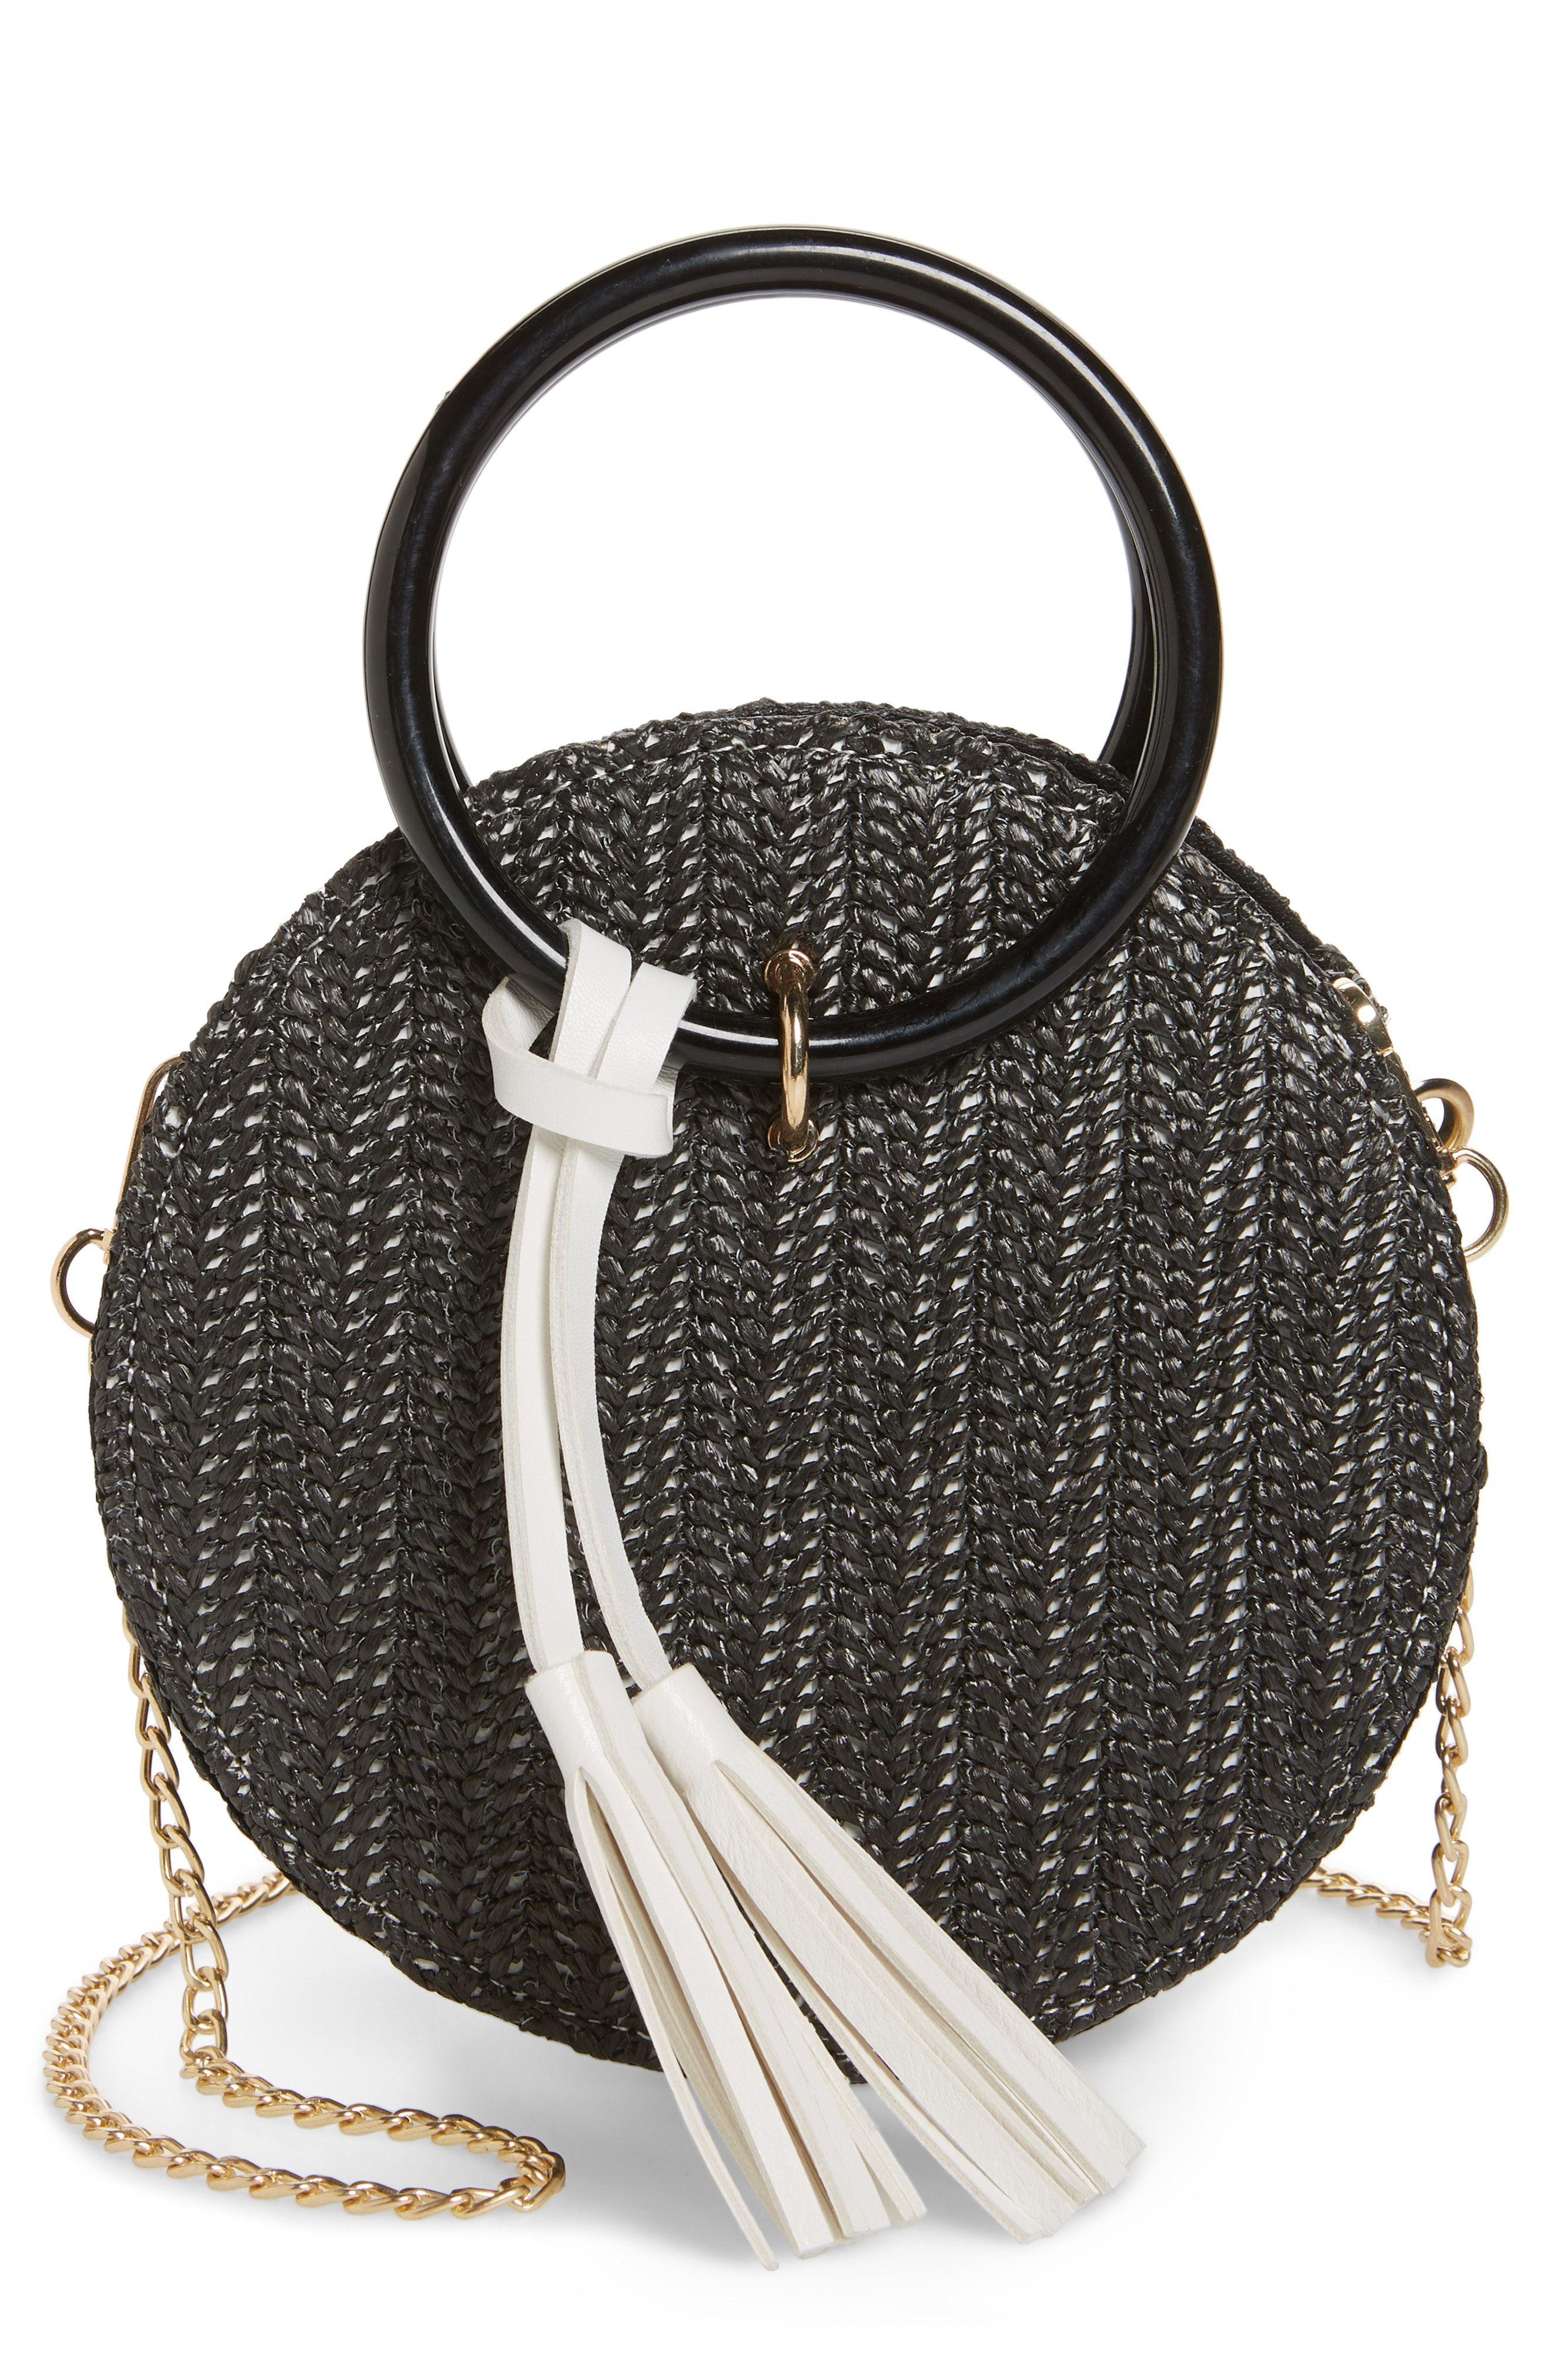 4e4efc7f9168 Straw Handbags 2019 – Hanna Oaks